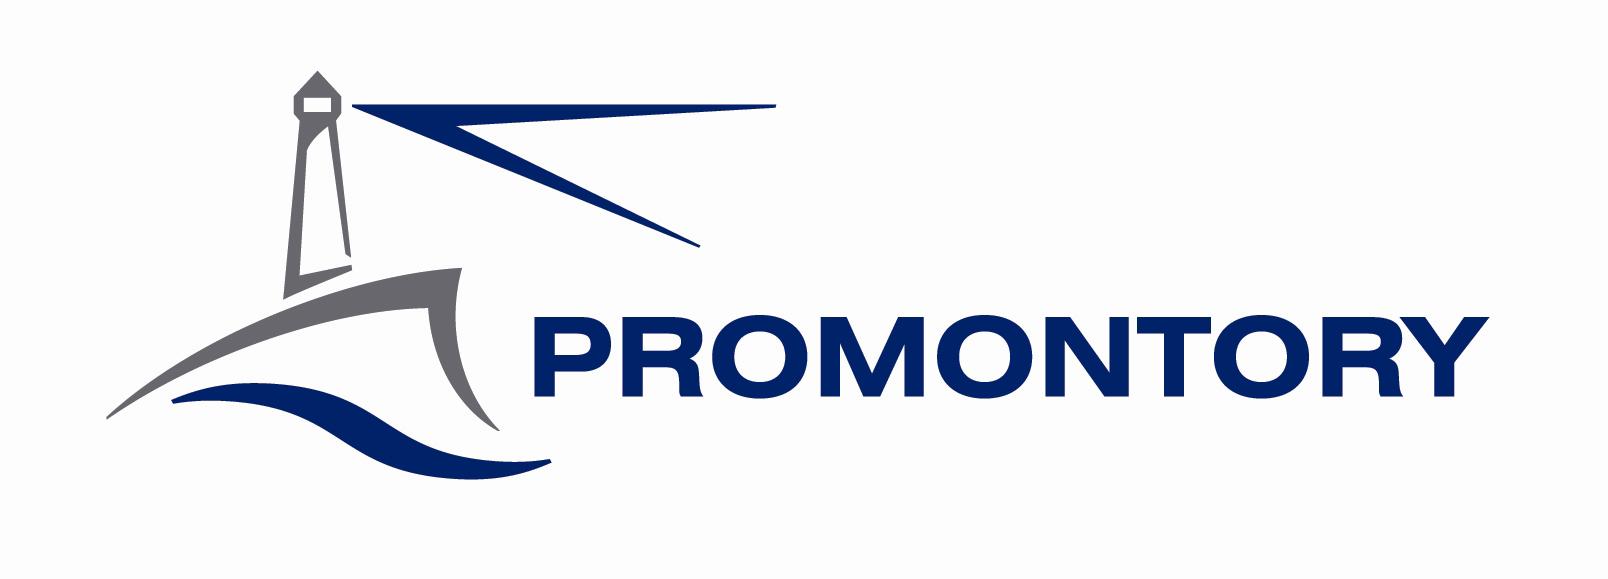 Promontory-Logo-Large.jpg